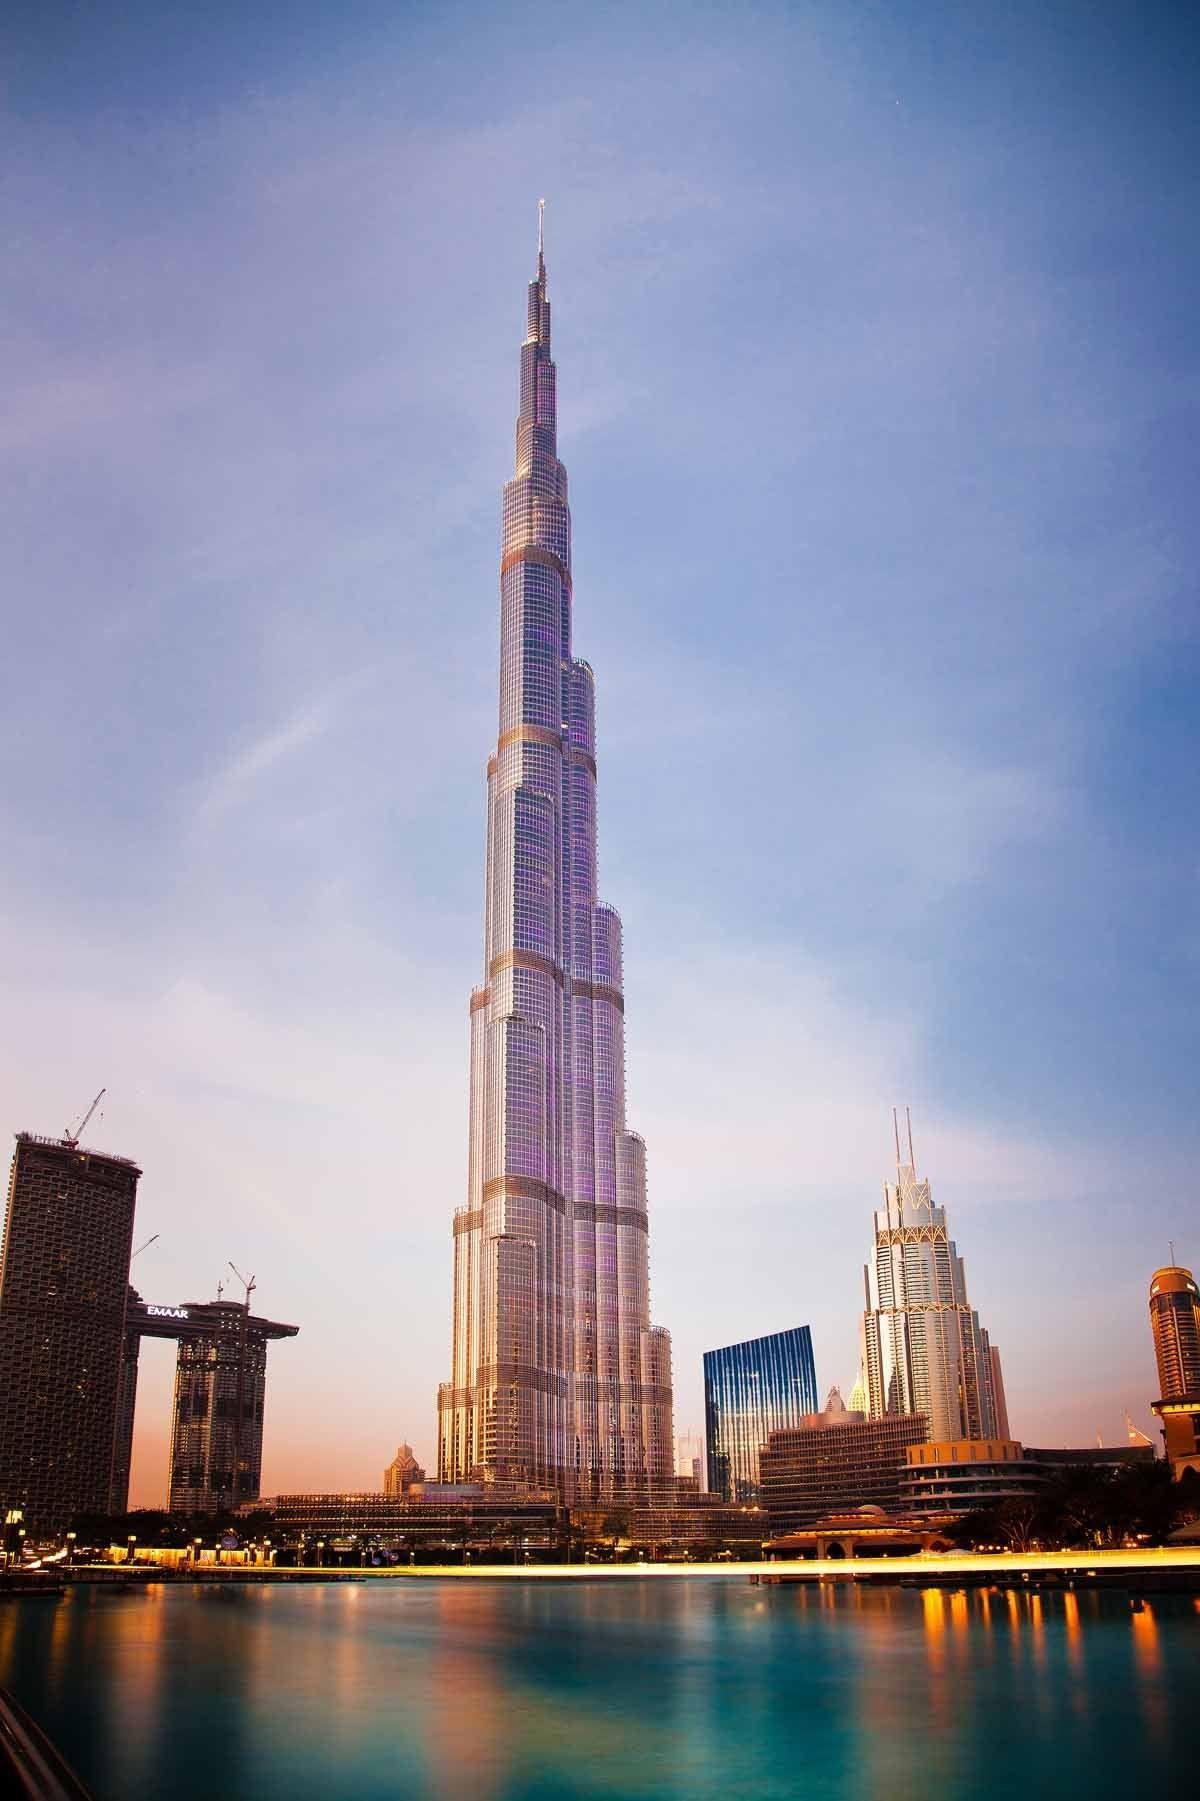 Top 12 AMAZING Things to do in Dubai (UAE) | Dubai attractions, Dubai  travel, Visit dubai